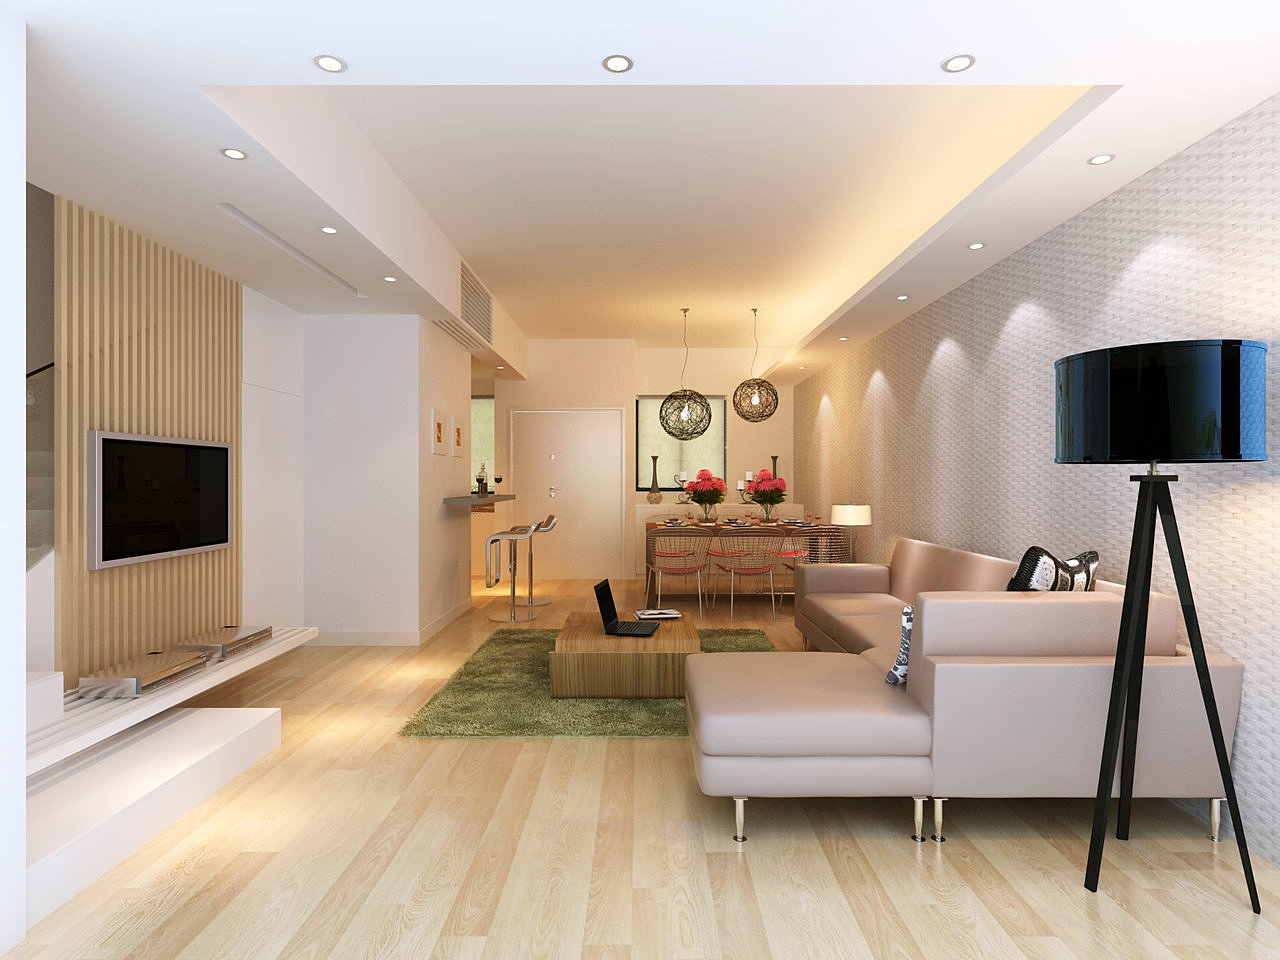 Home Revolt Limited interior design